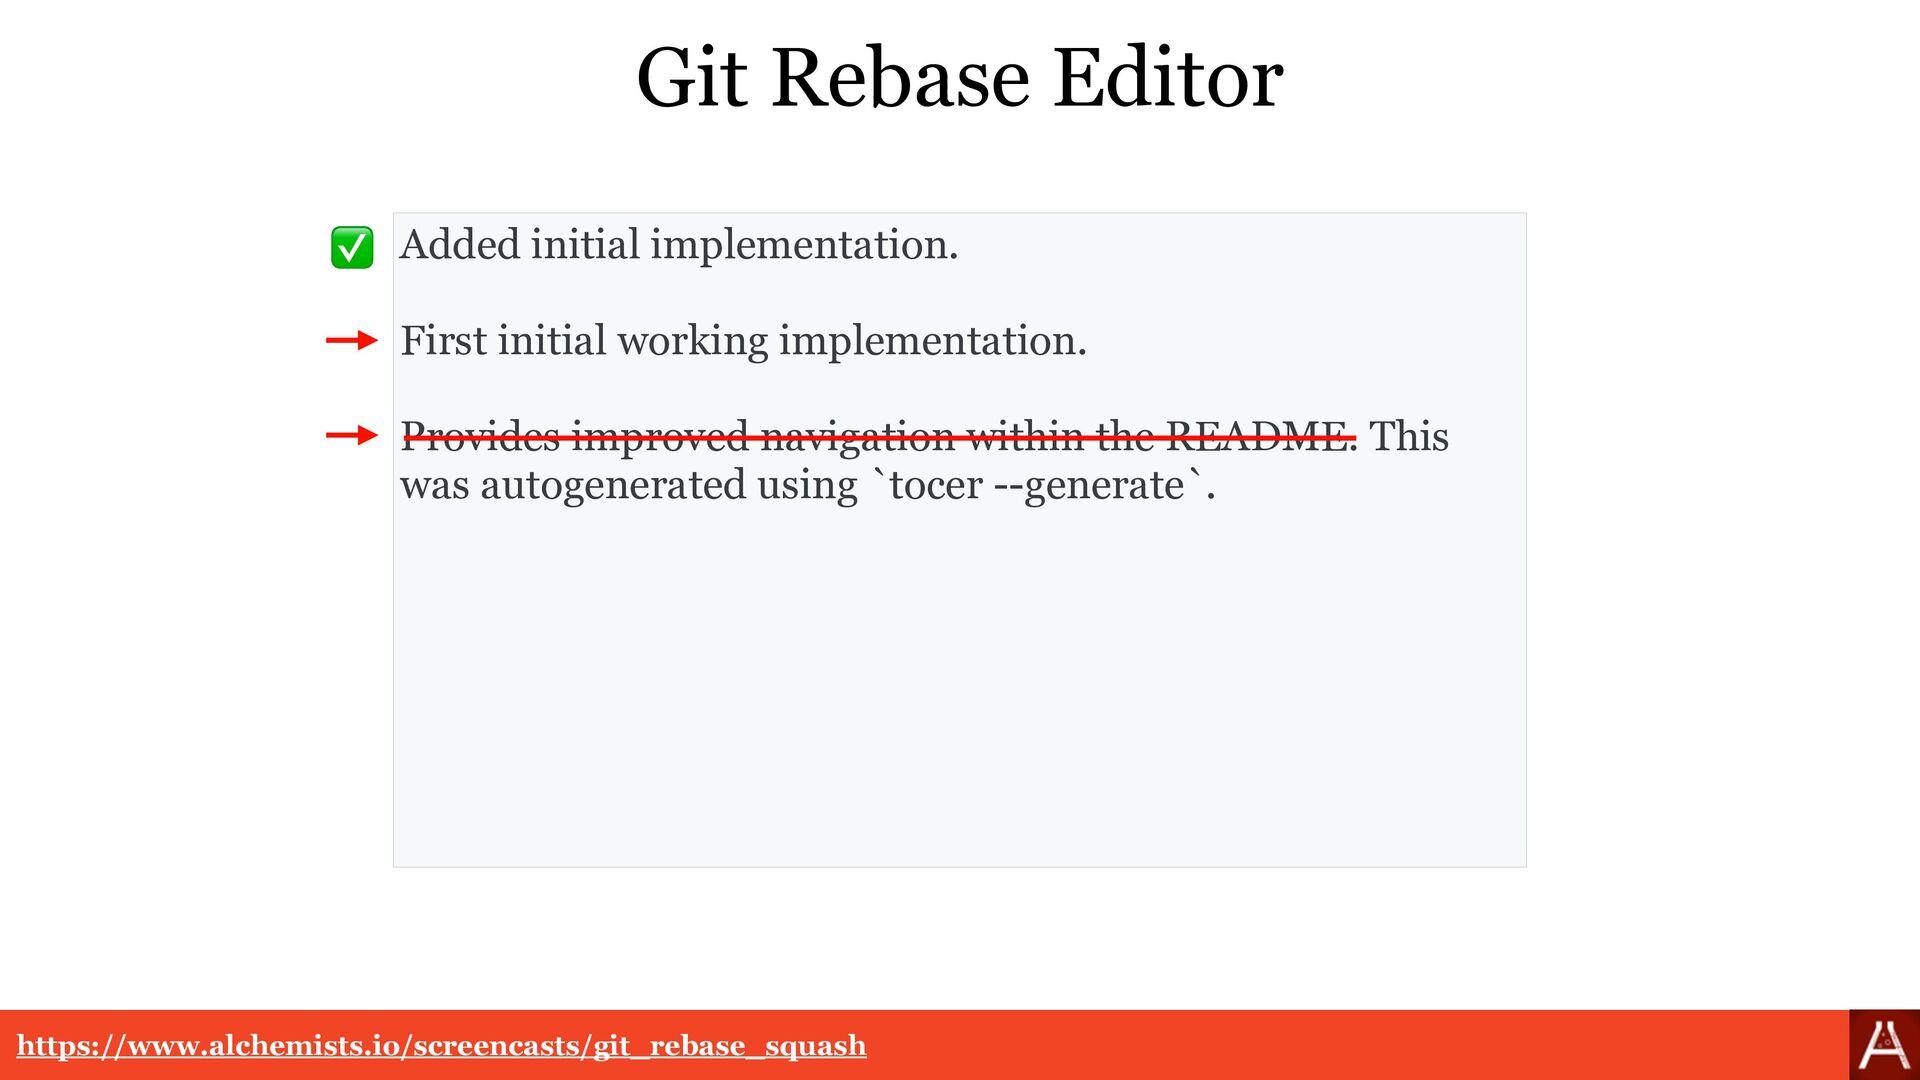 Git Rebase Fixup https://www.alchemists.io/scre...